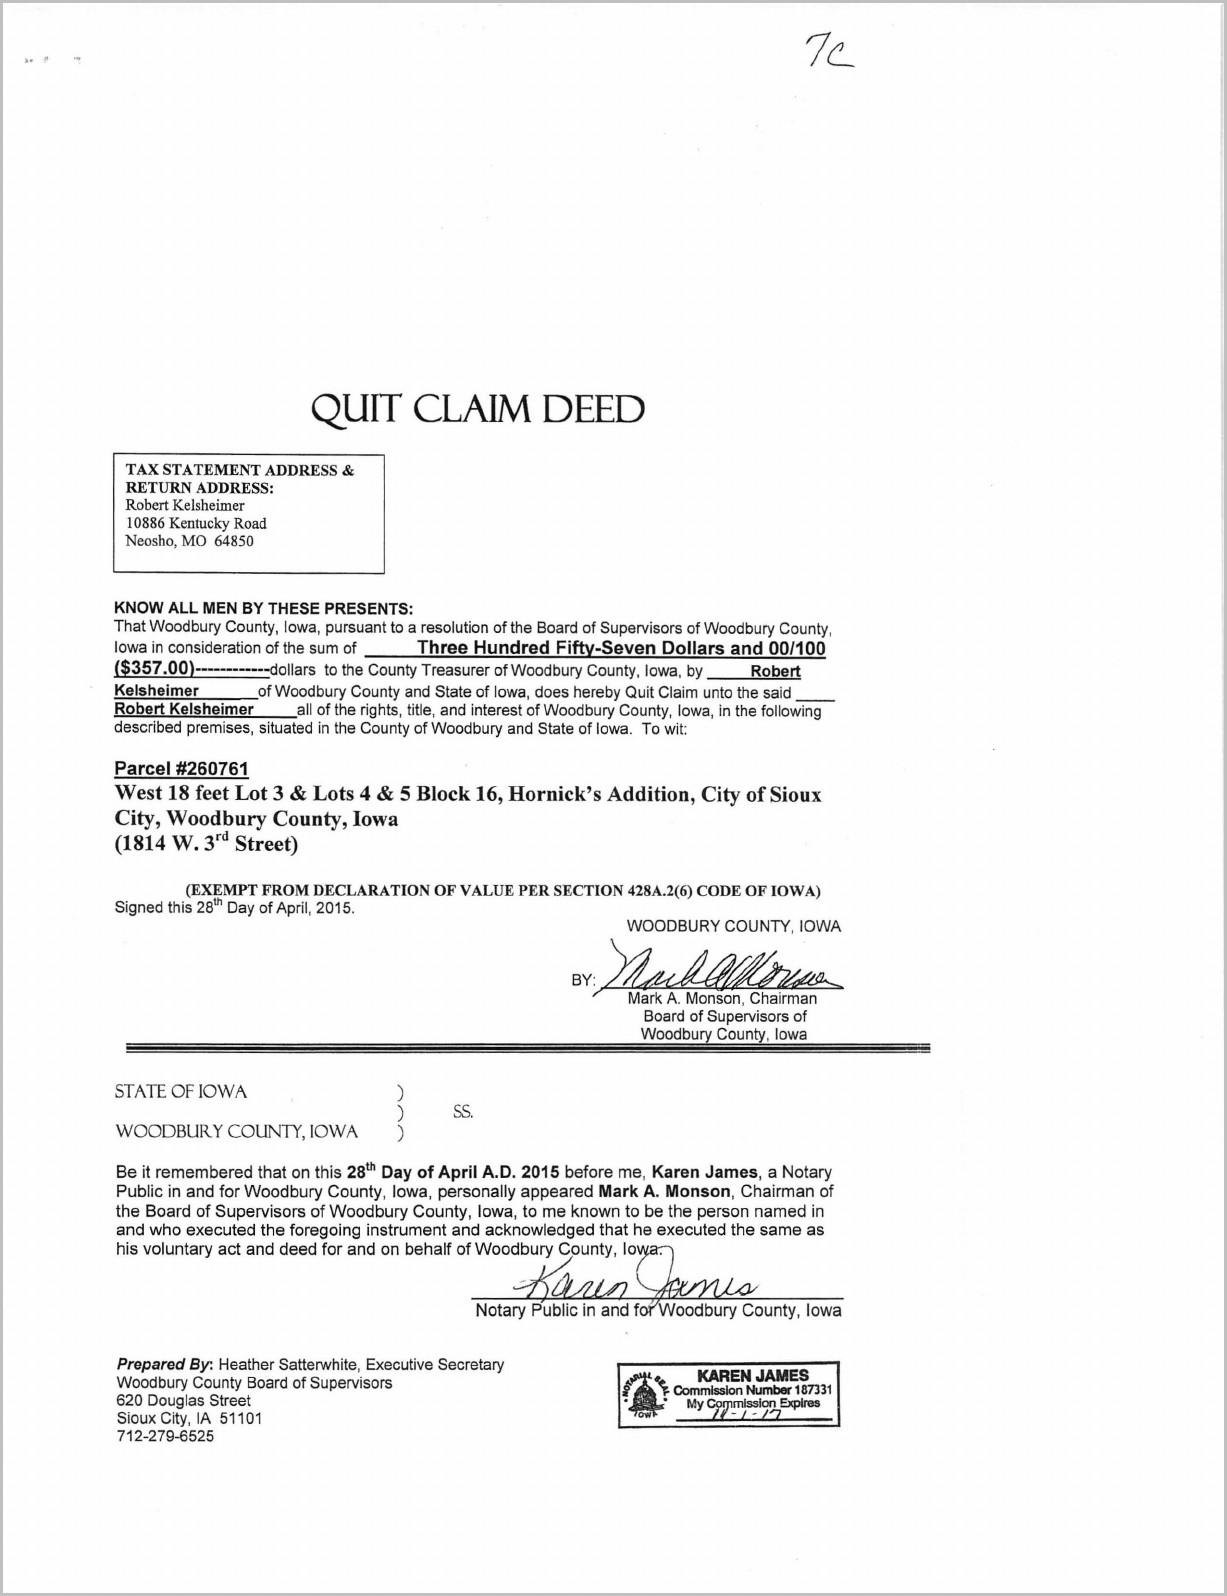 Michigan Grant Deed Form